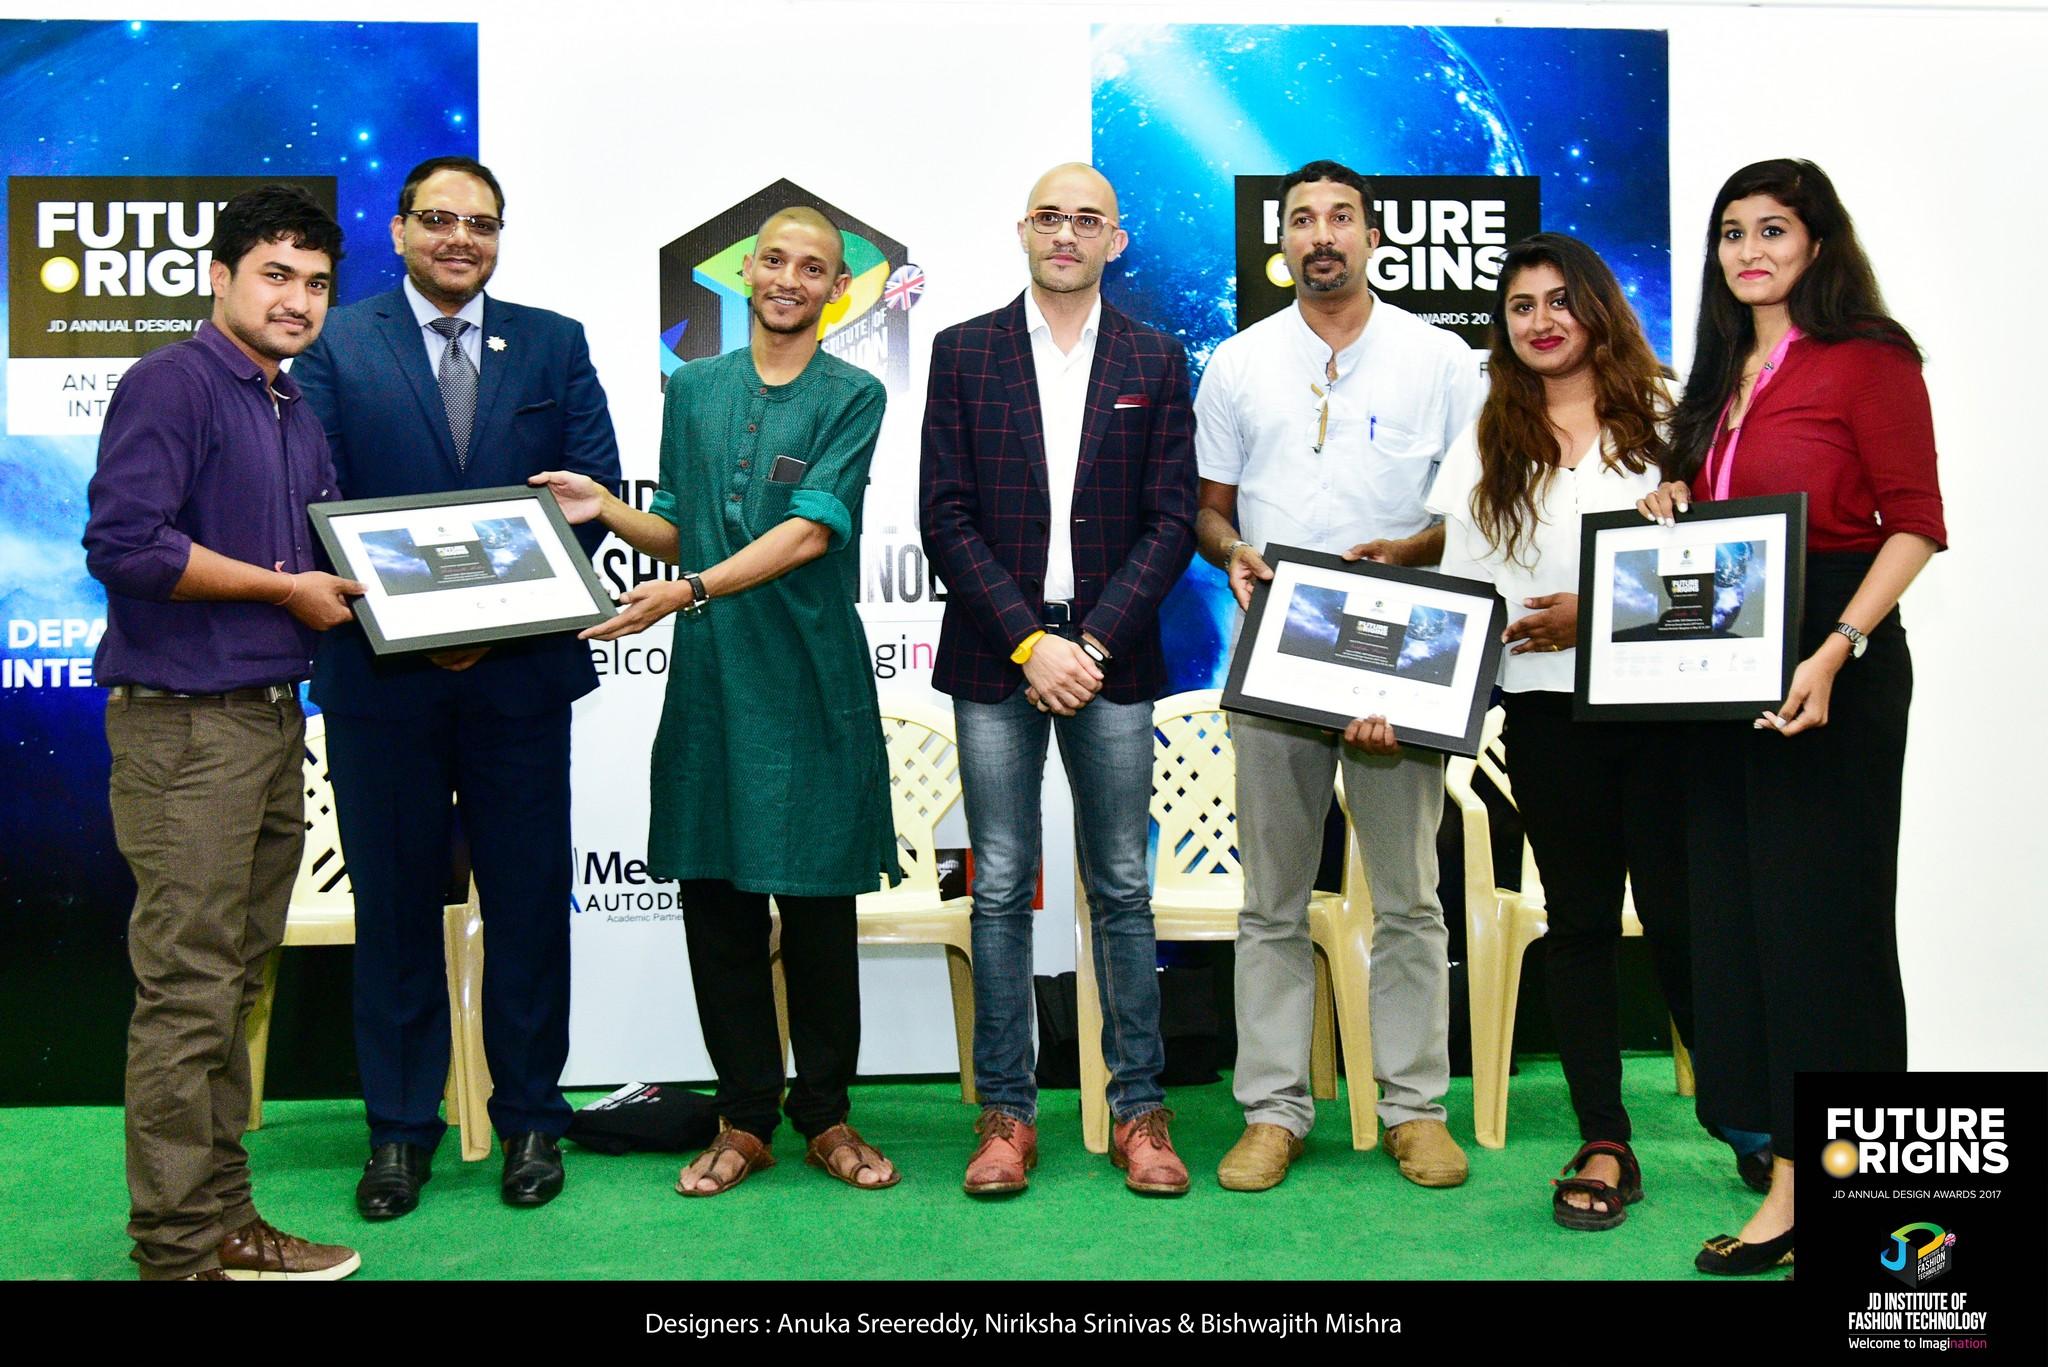 Fangled – Future Origin – JD Annual Design Awards 2017 - Interior Design | Photography : Jerin Nath (@jerin_nath) fangled Fangled – Future Origin – JD Annual Design Awards 2017 Fangled     Future Origin     JD Annual Design Awards 2017 3